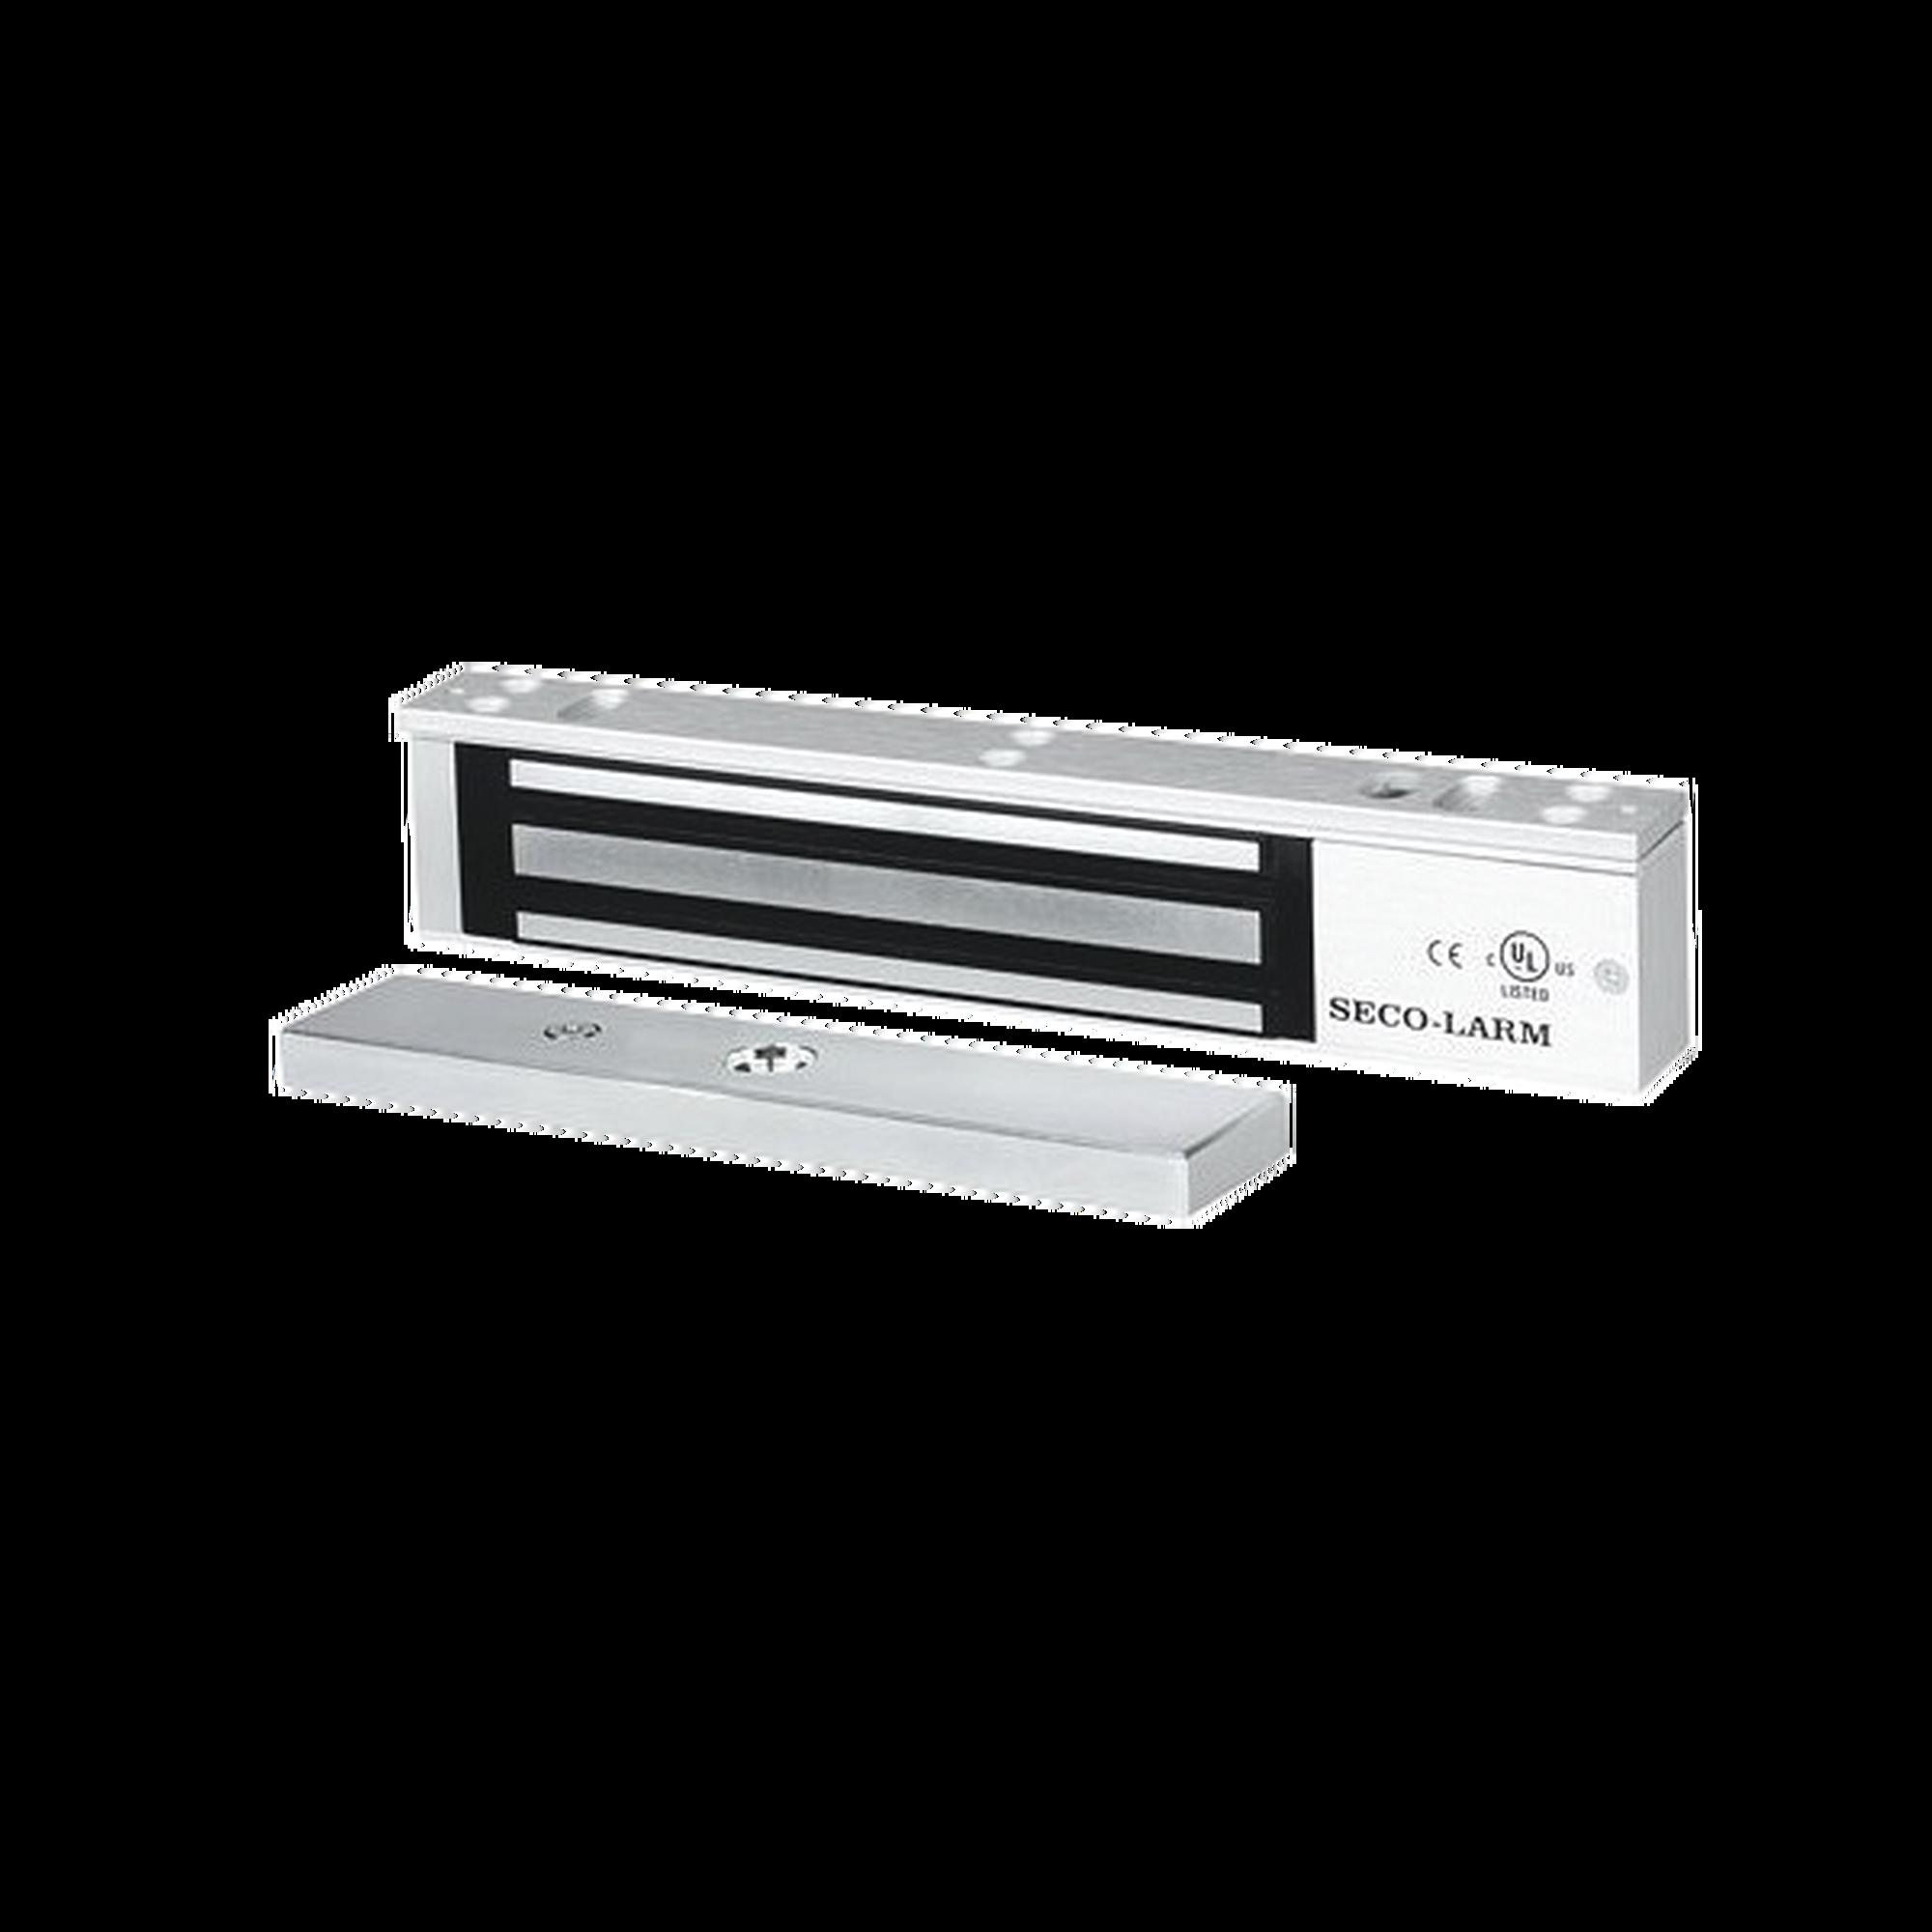 Chapa magnetica  de 600-lb, LED de estatus